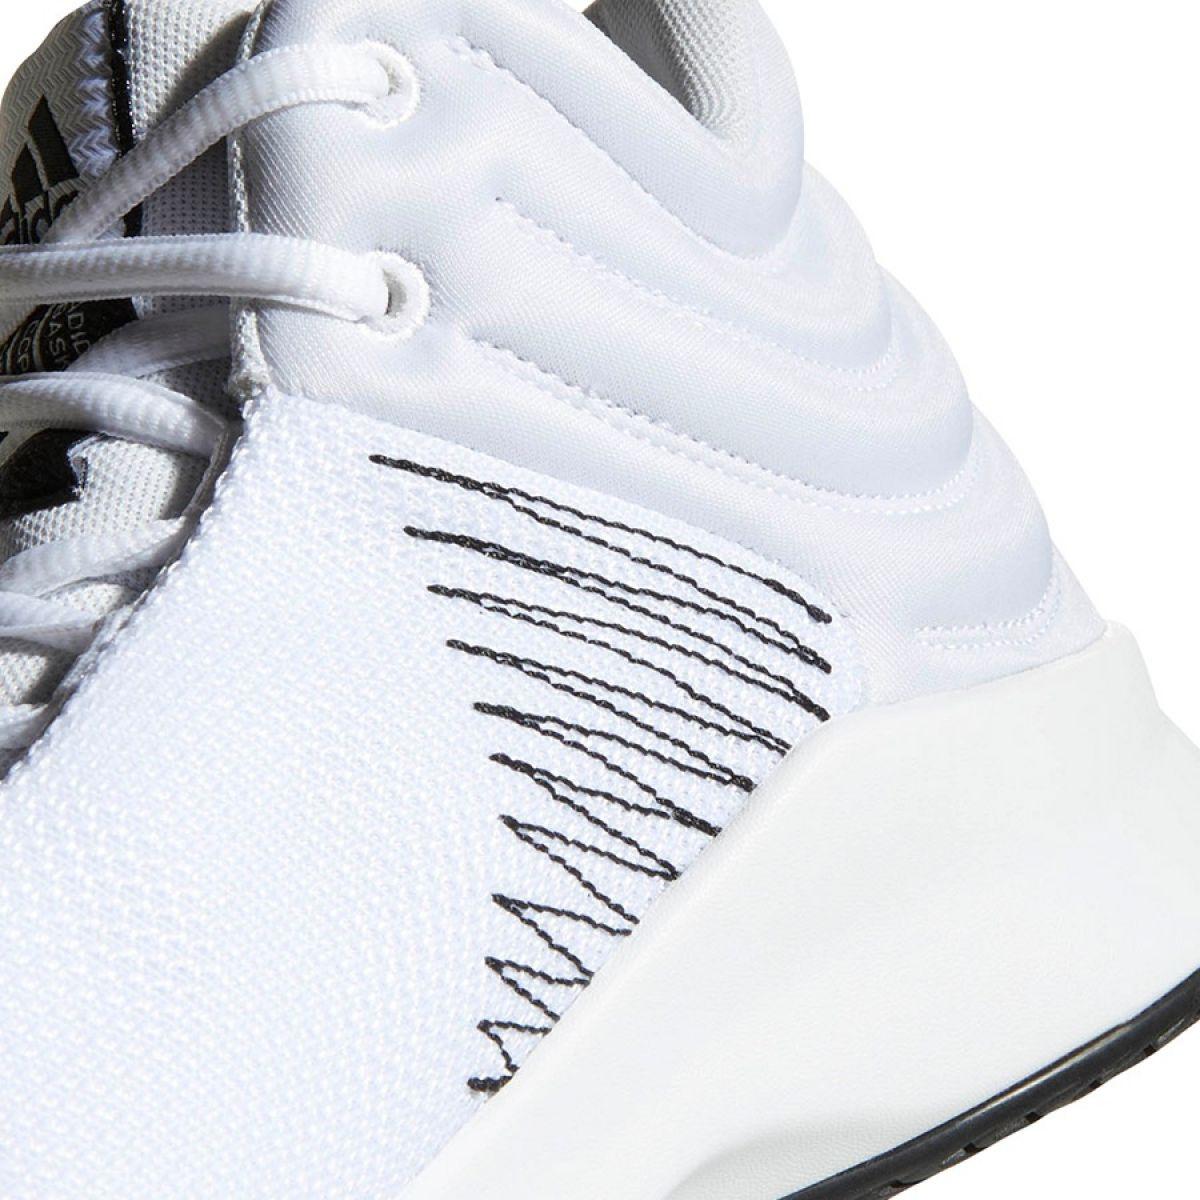 Adidas Pro Sprak 2018 M B44966 kosárlabdacipő fehér fehér